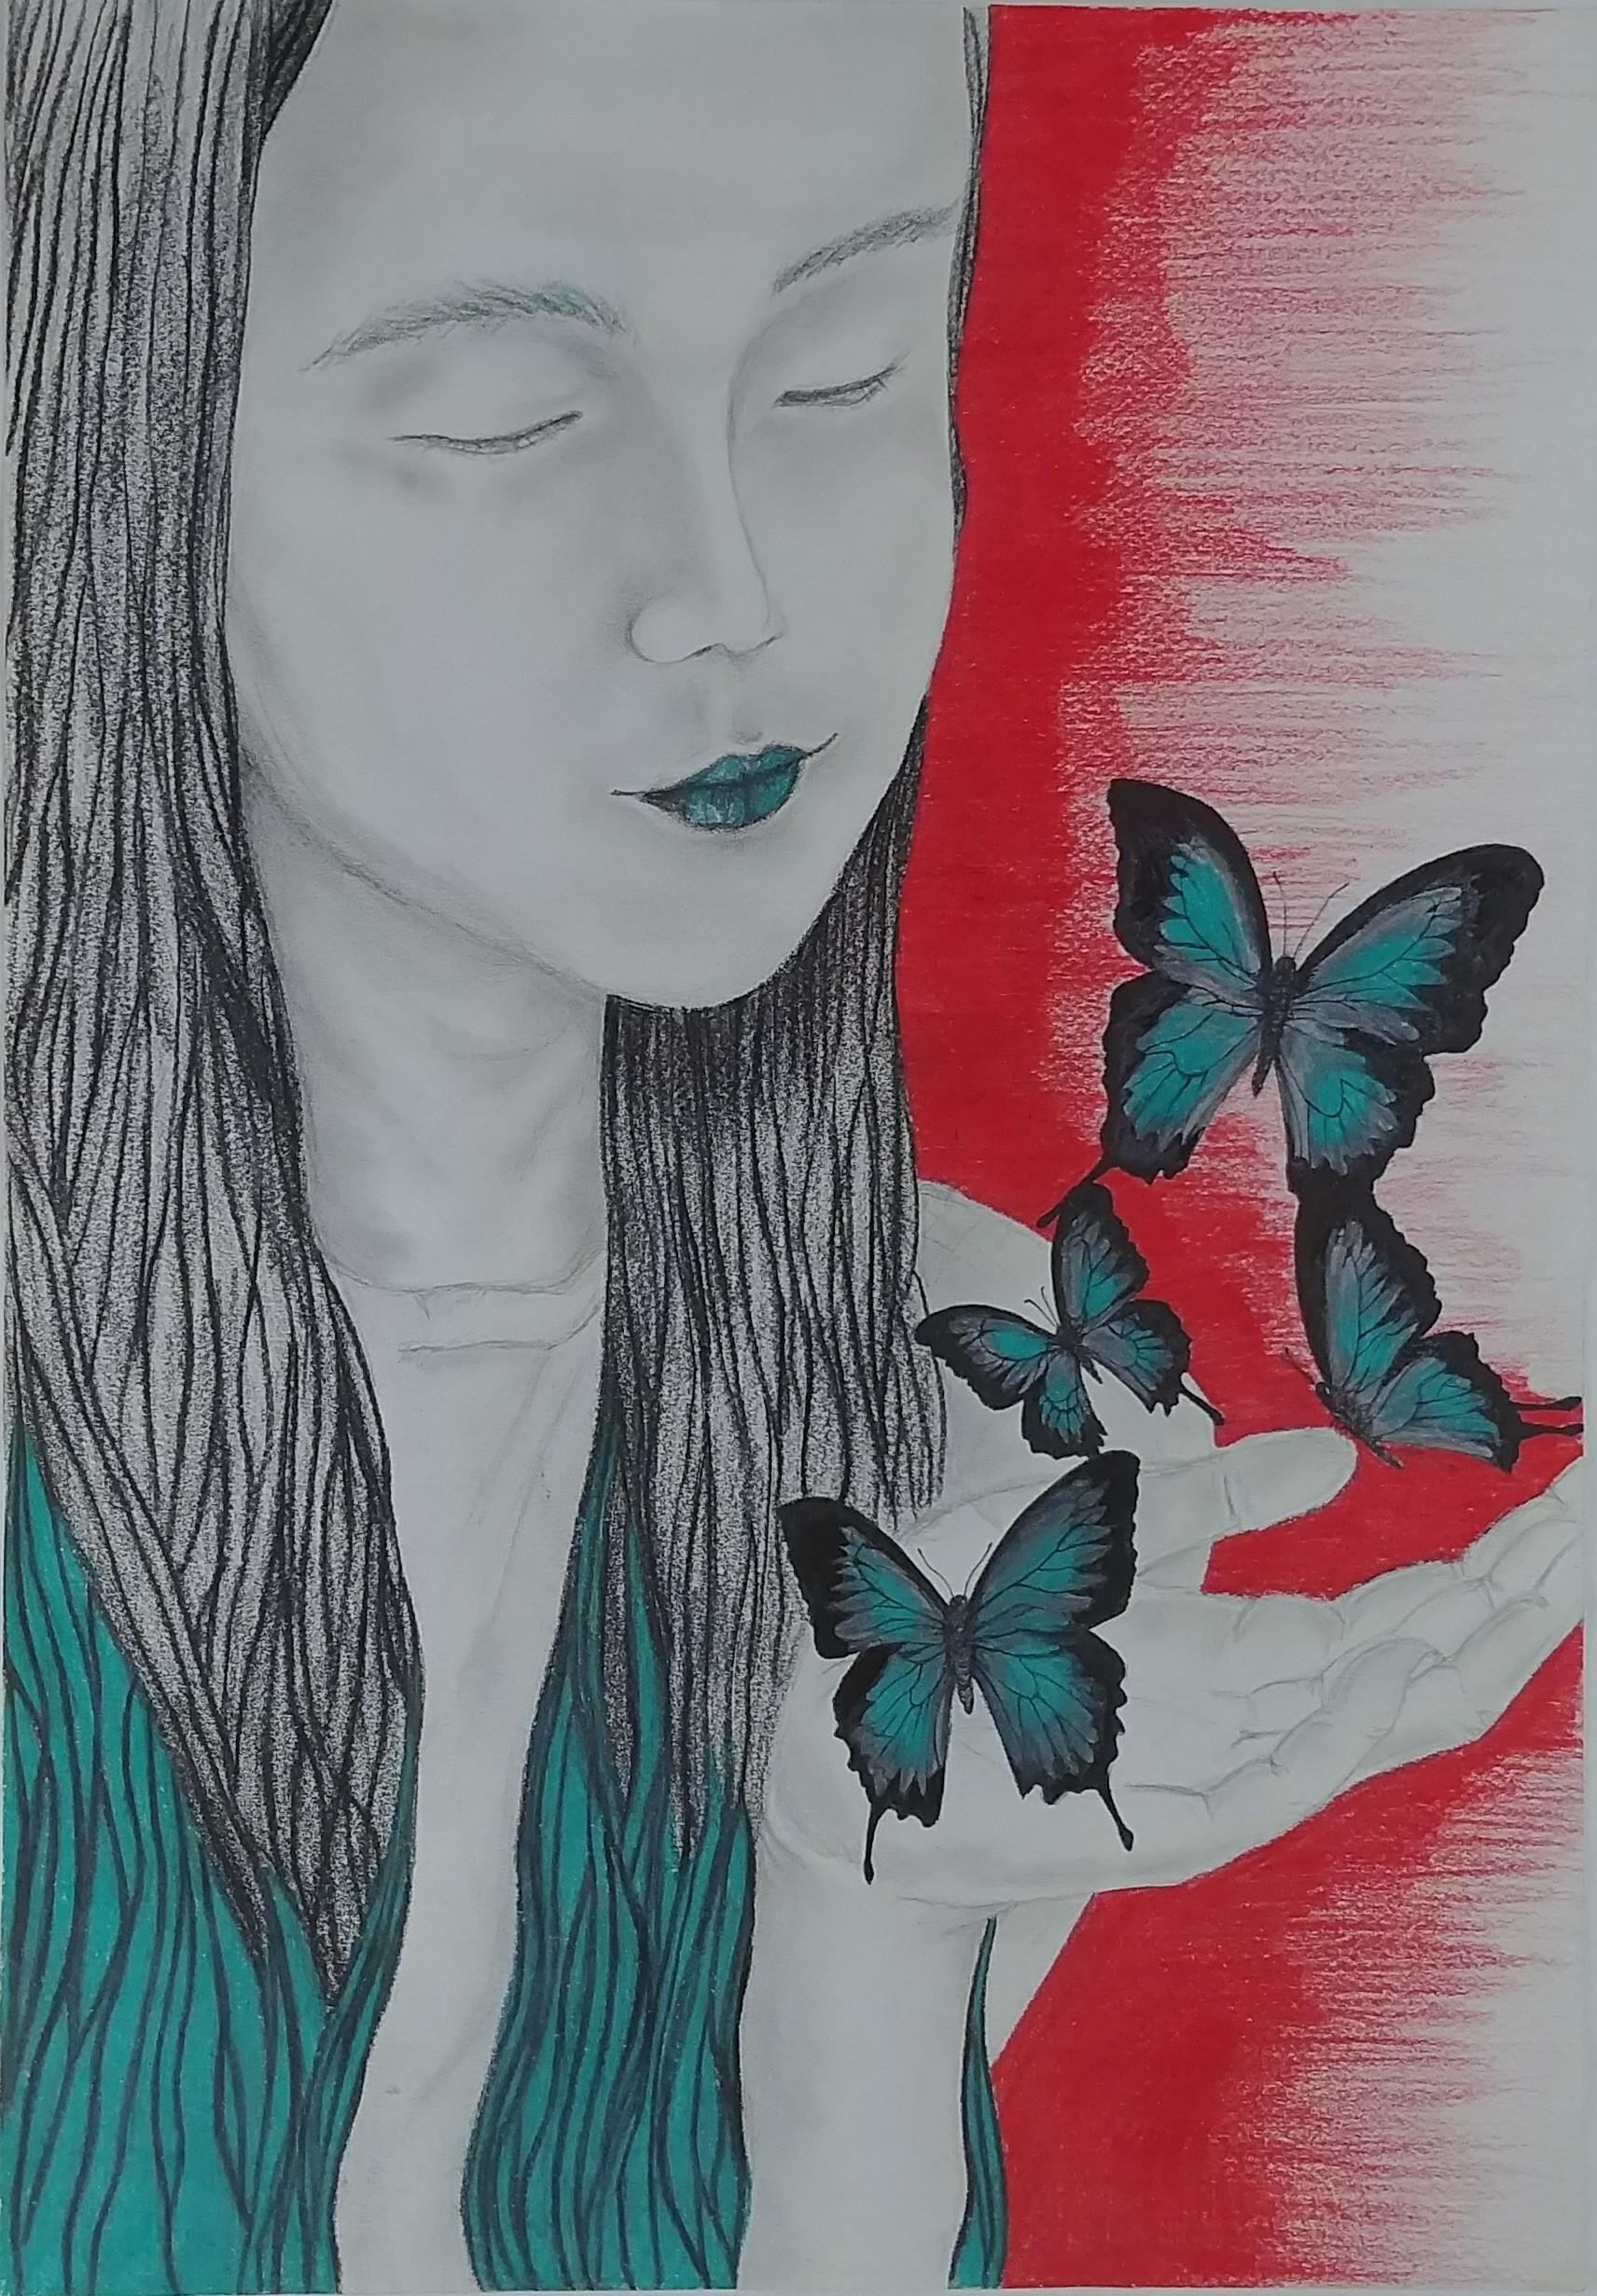 Self Portrait artwork by Hyun Ji - art listed for sale on Artplode